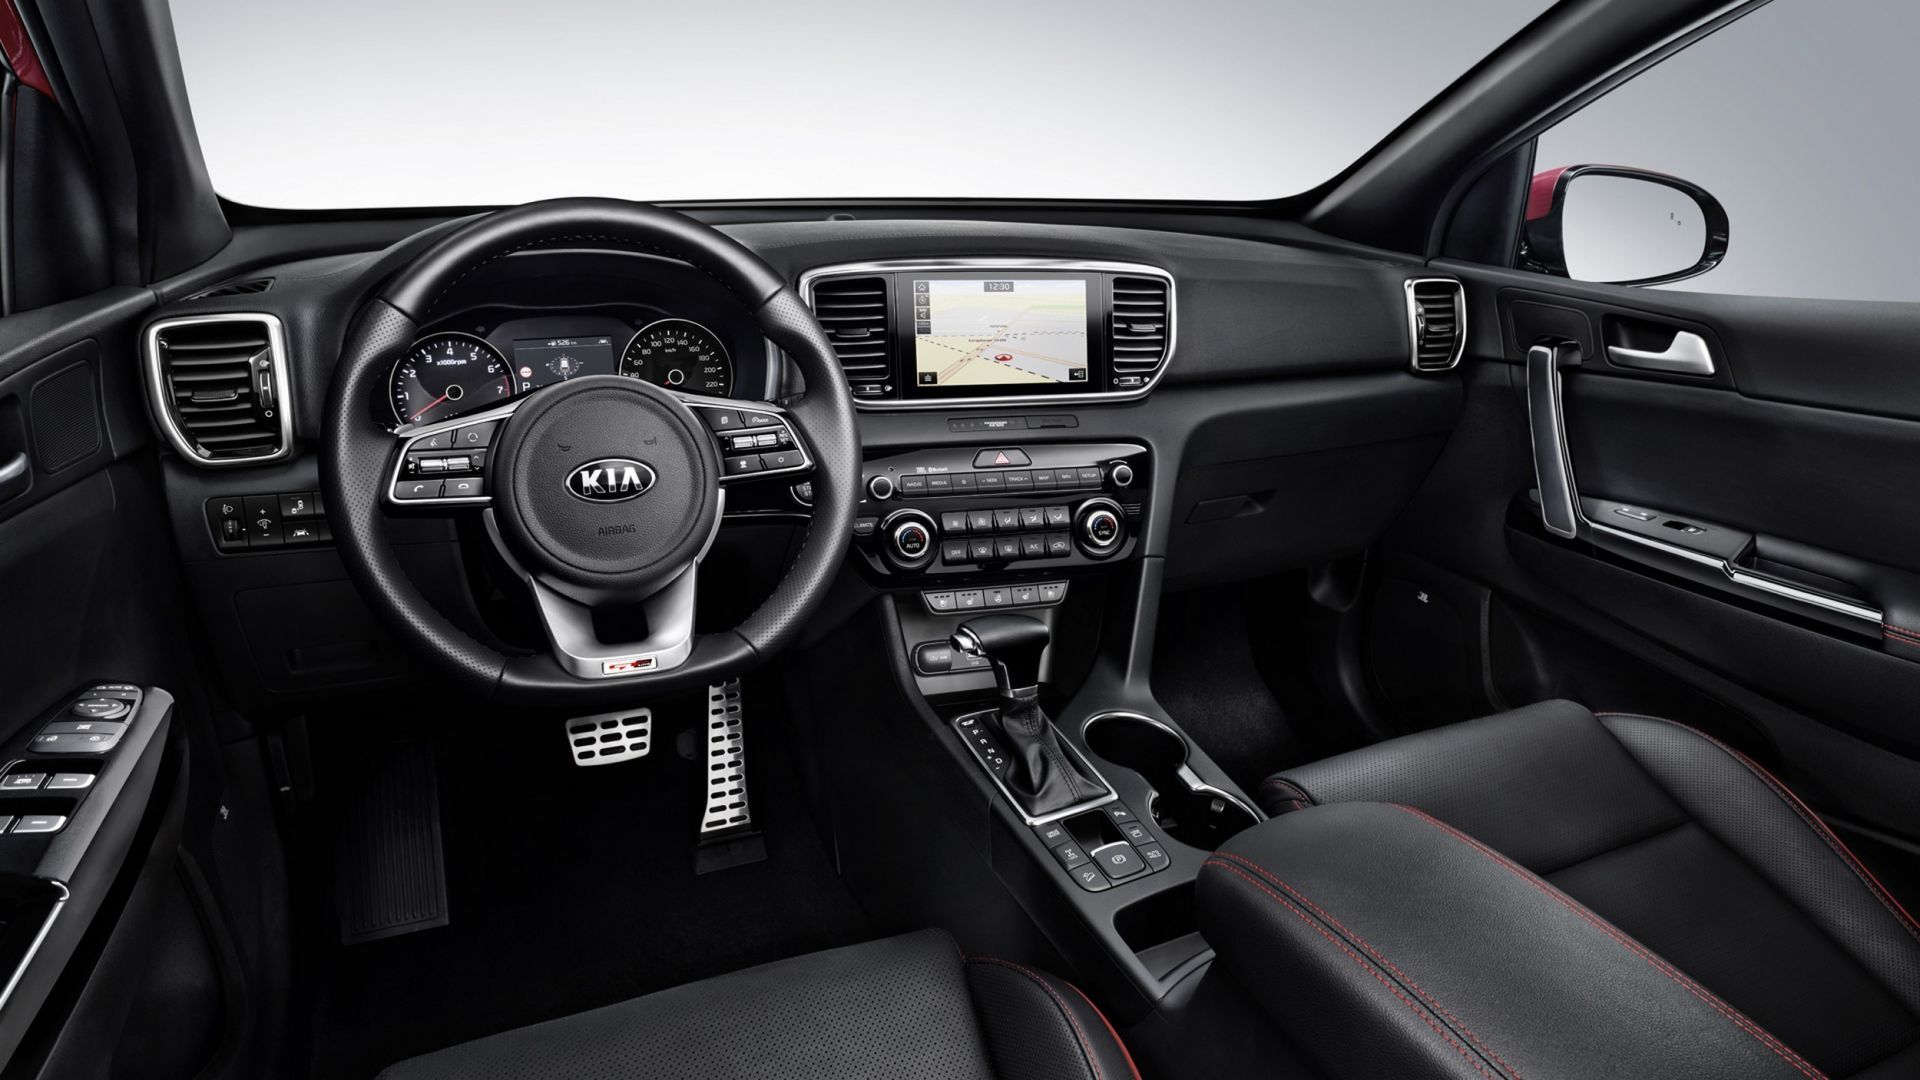 Nuova Kia Sportage 2018 Emissioni Gi 249 Col Mild Hybrid